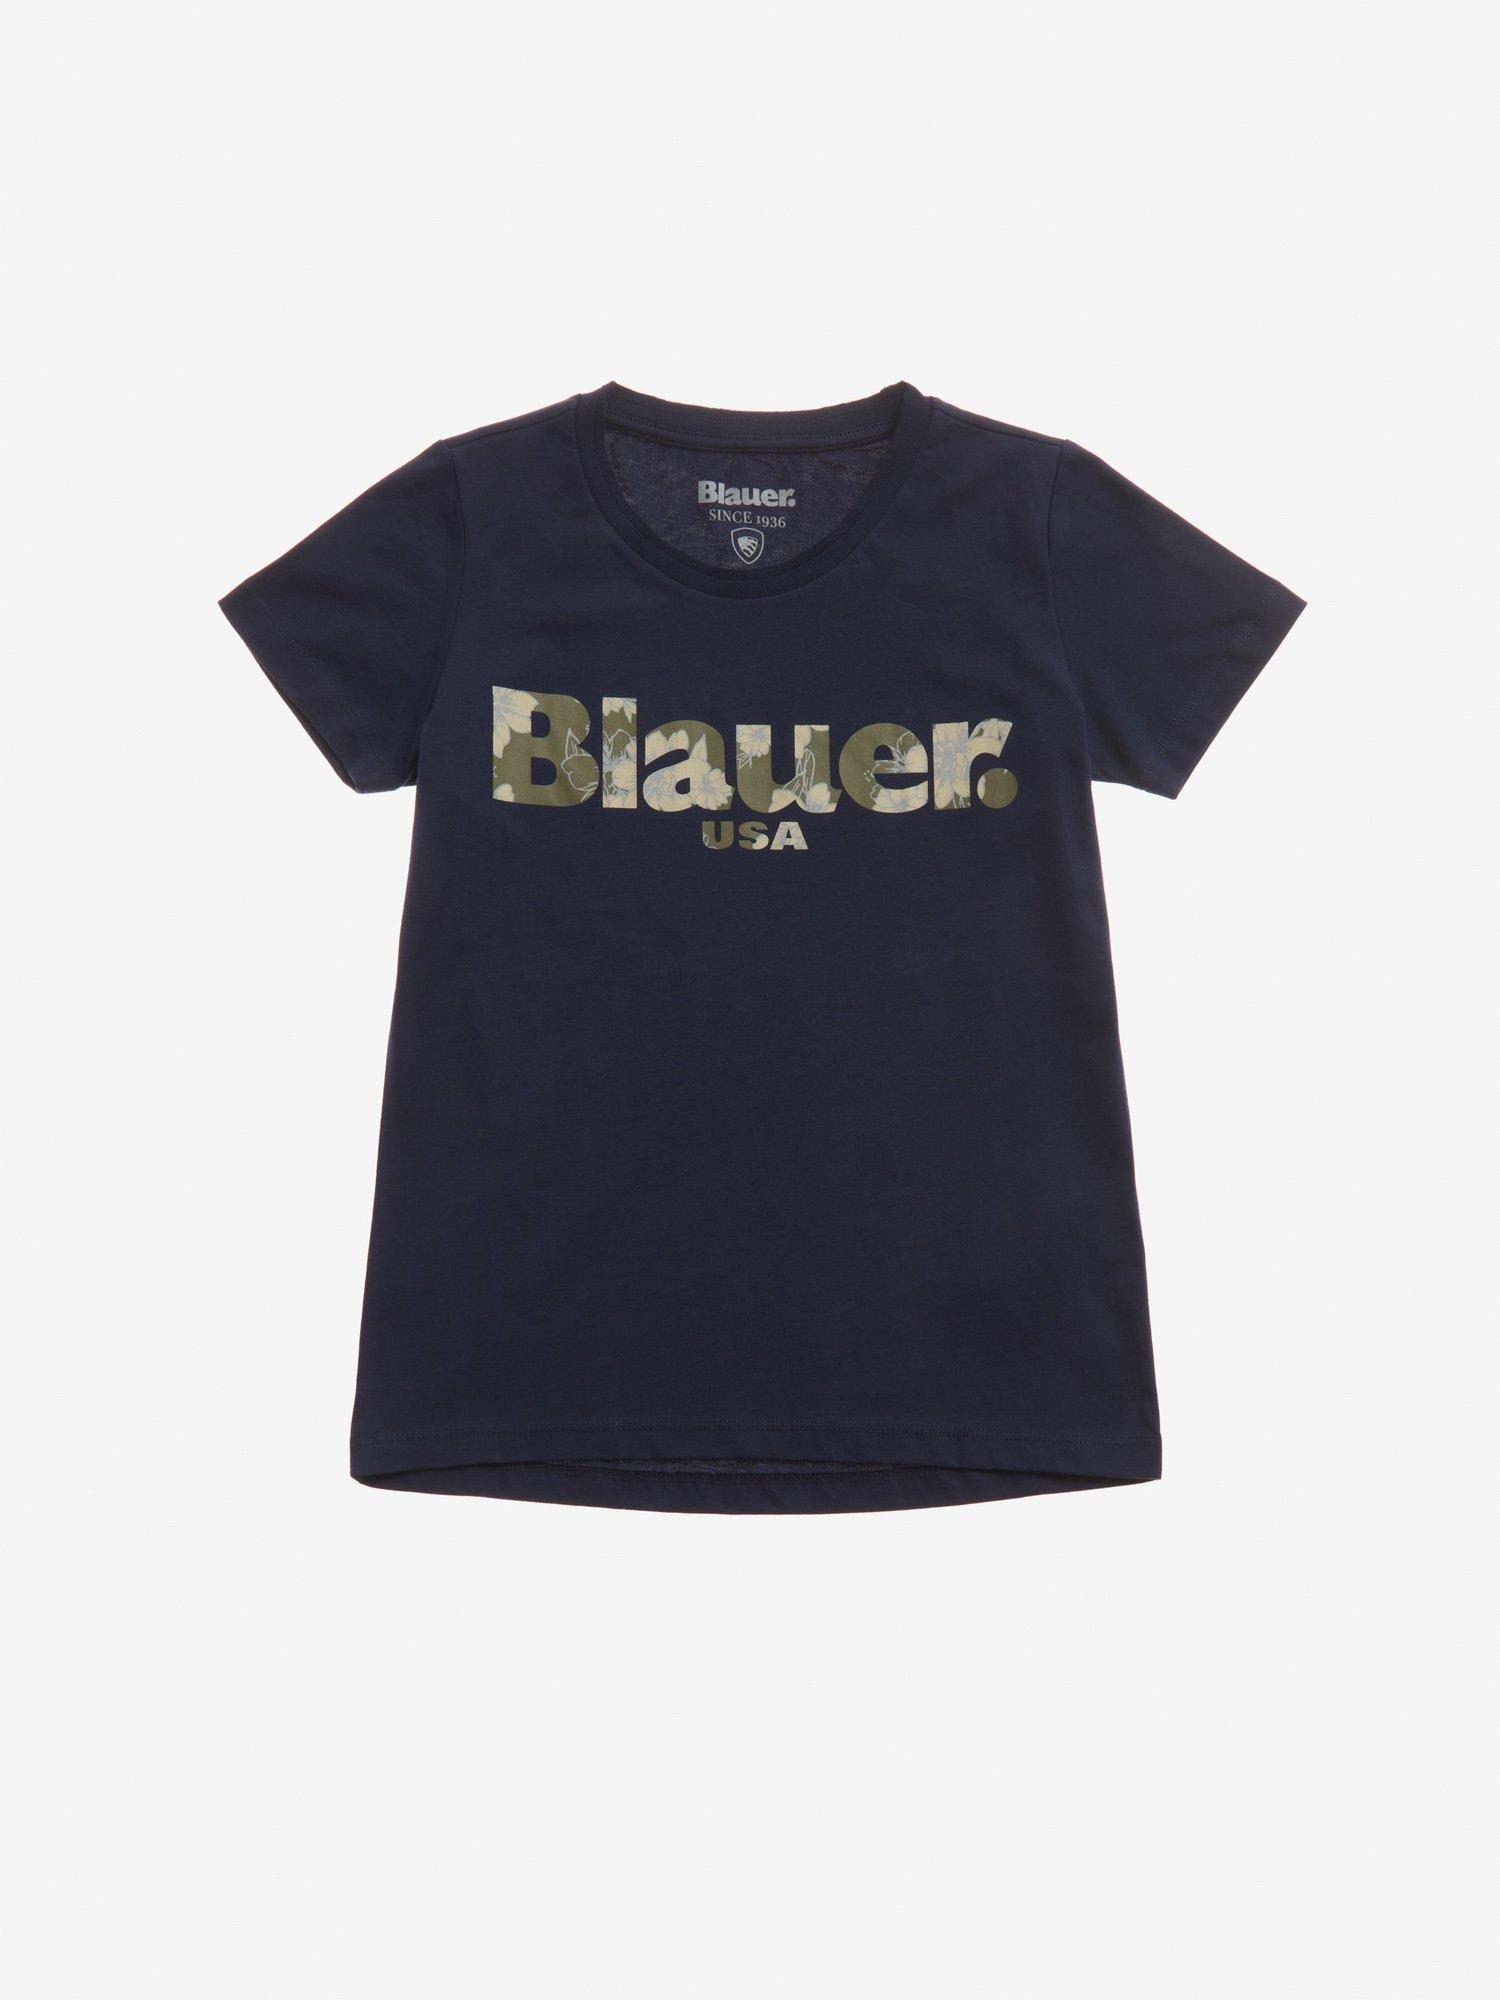 T-SHIRT BAMBINA BLAUER FLOREALE - Blauer